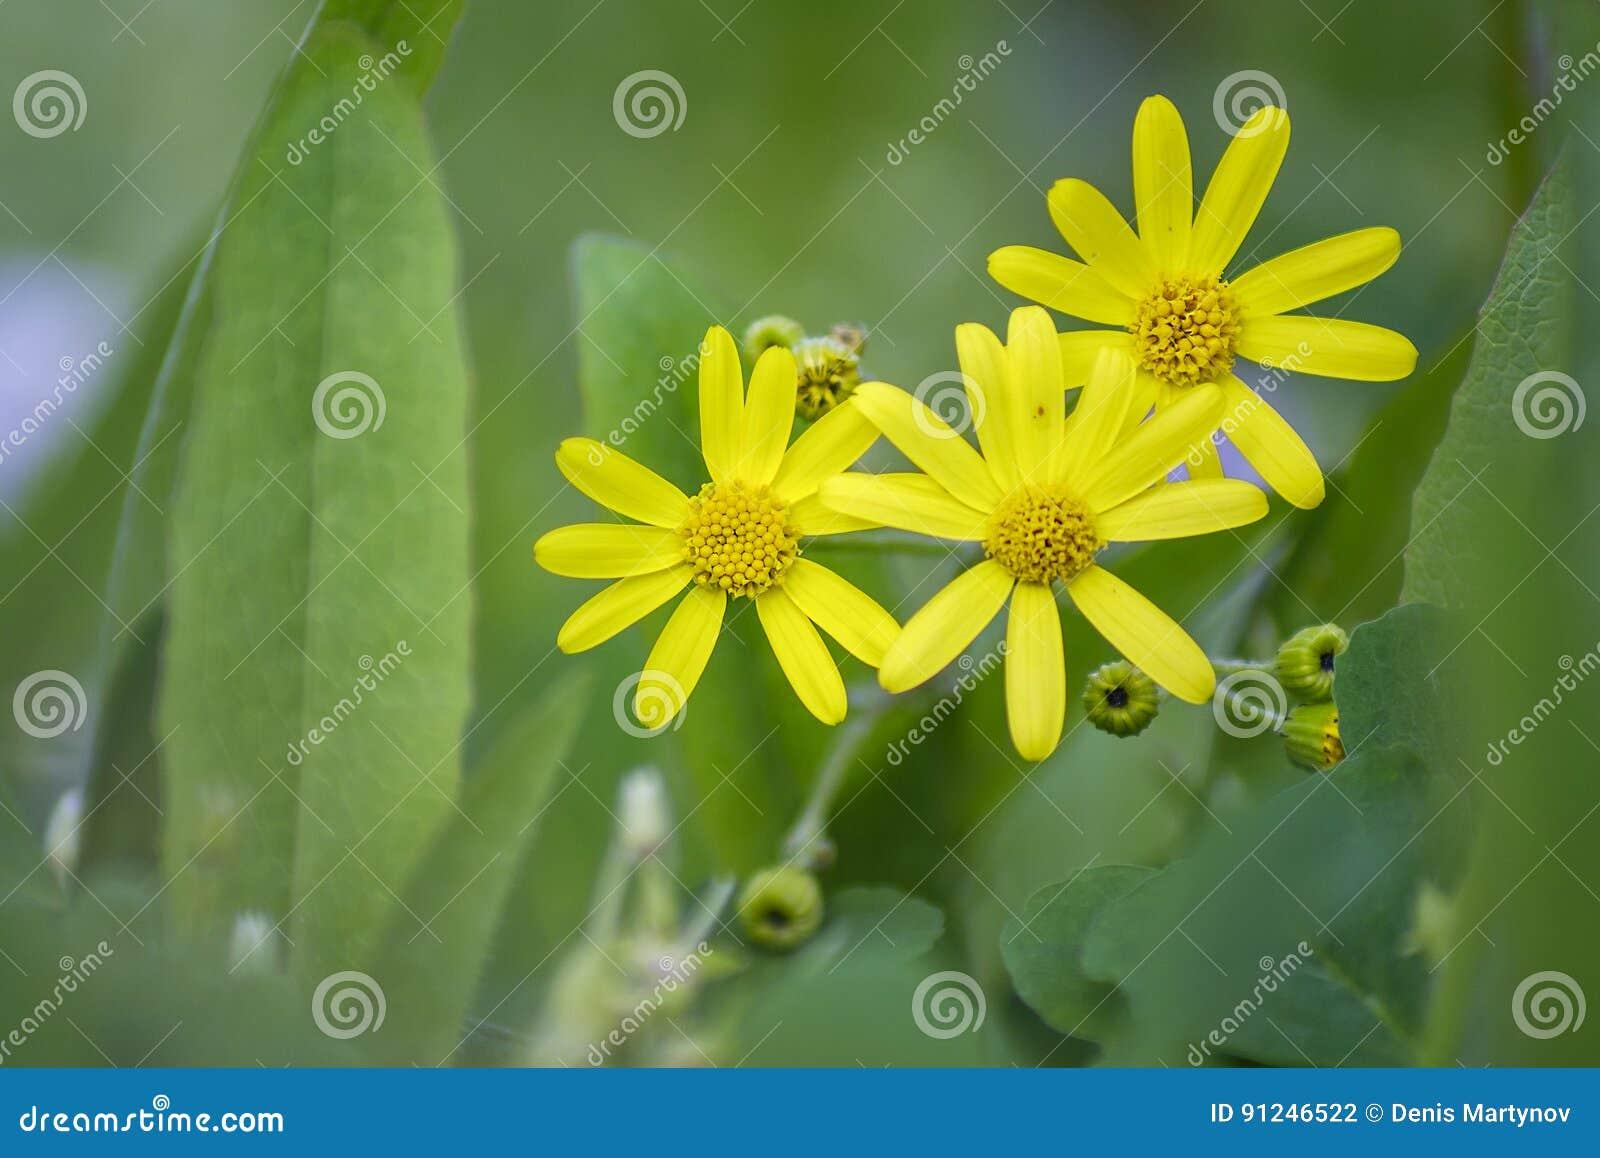 Small Yellow Flowers 3 Stock Photo Image Of Garden Lush 91246522